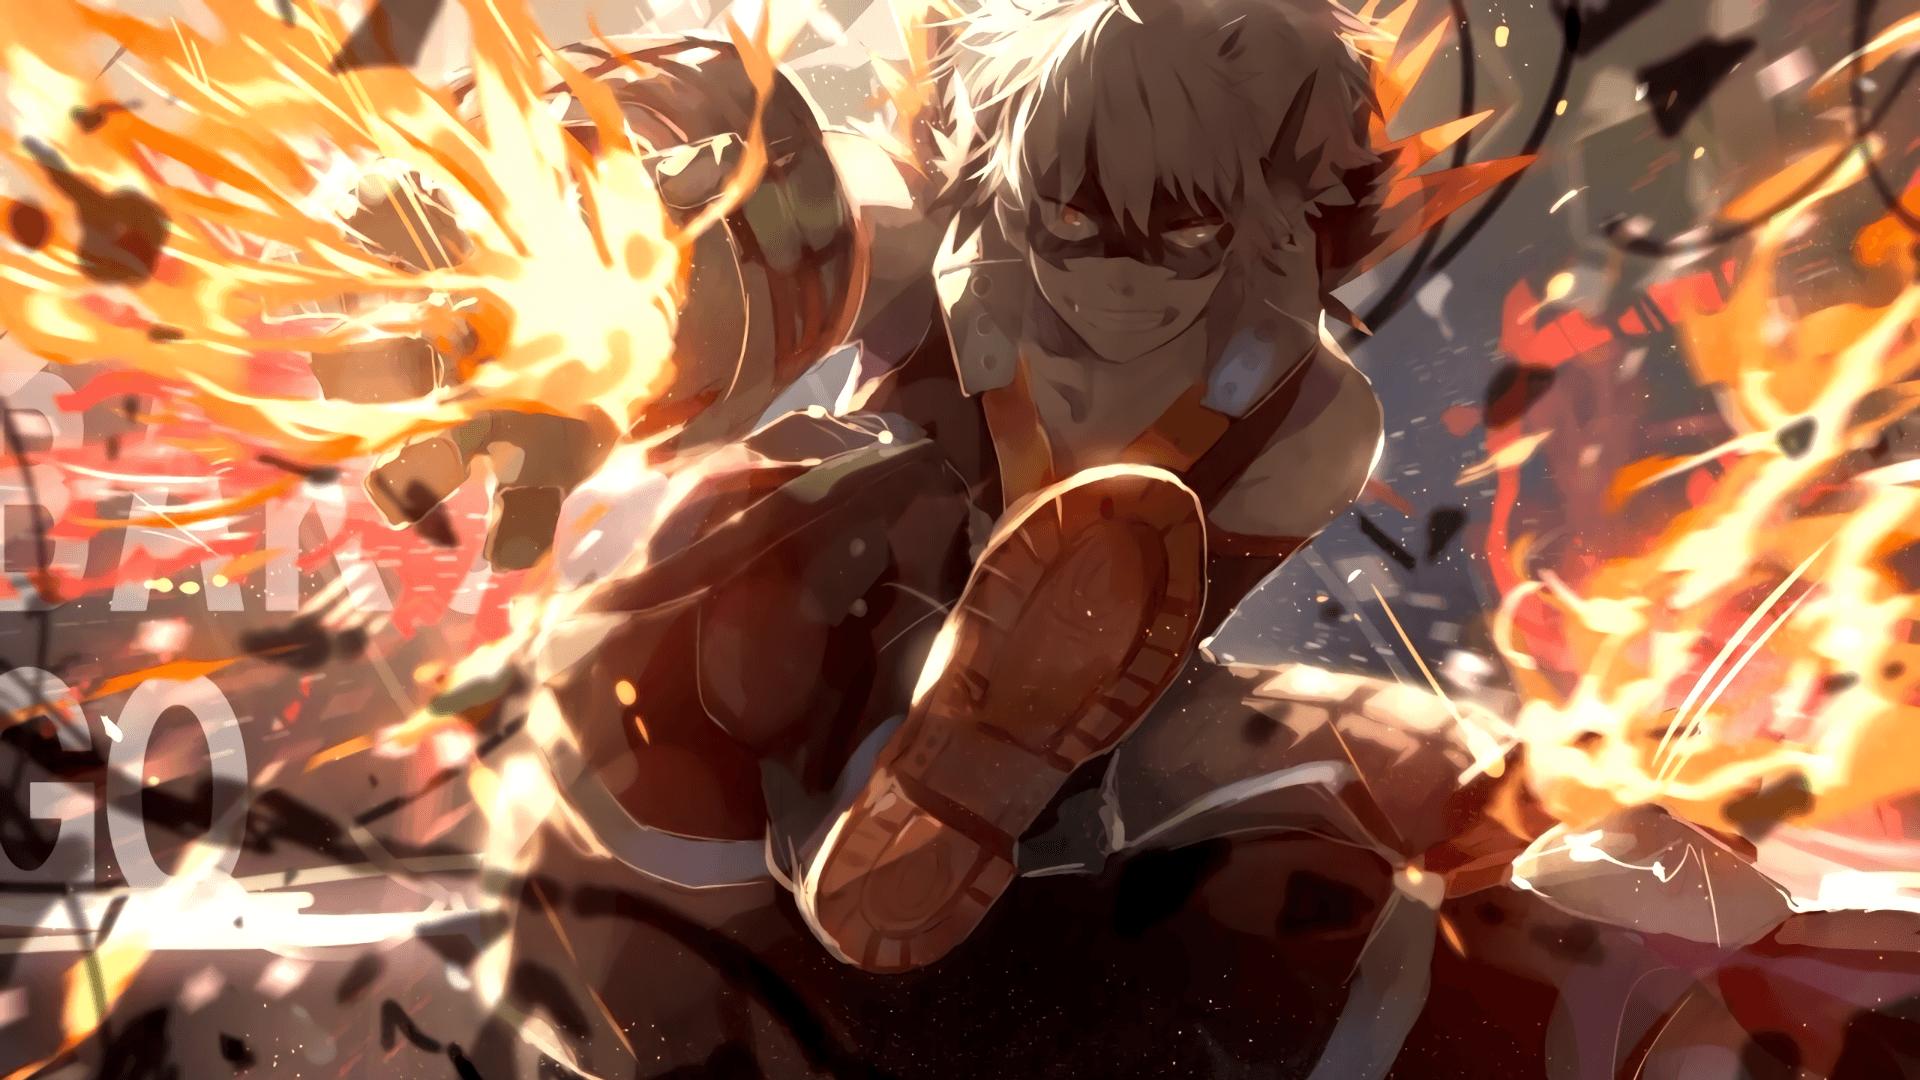 229 Katsuki Bakugou Hd Wallpapers Background Images Wallpaper Anime Wallpaper Anime Fight Hd Anime Wallpapers